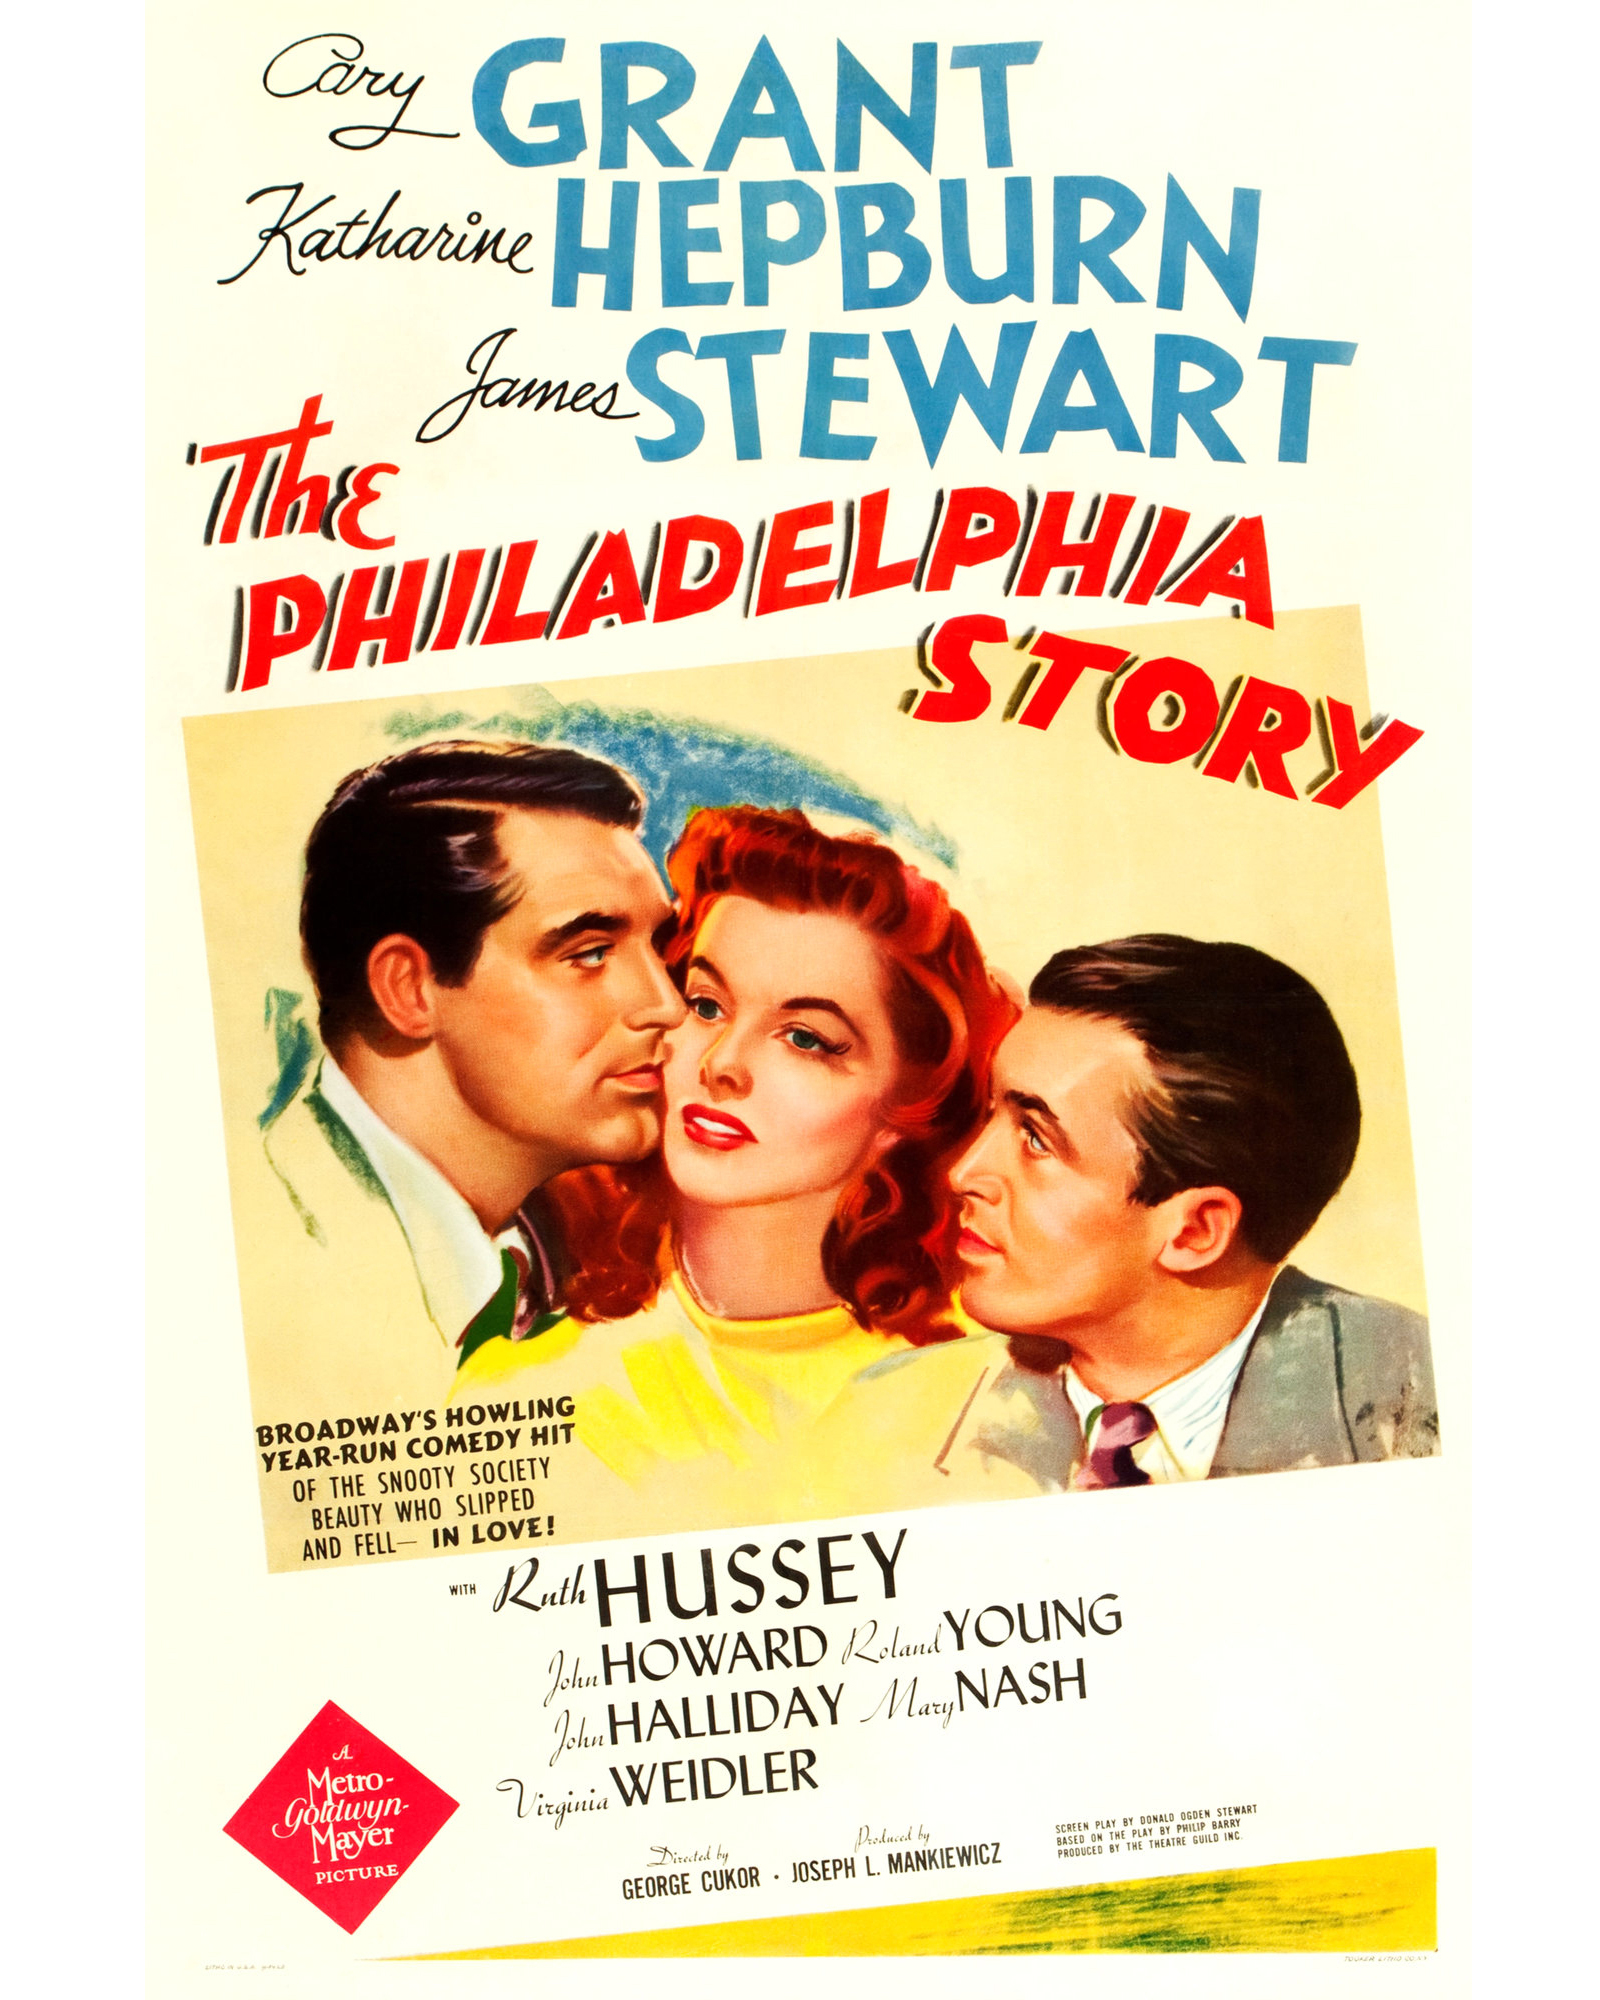 wedding-movies-the-philadelphia-story-1115.jpg